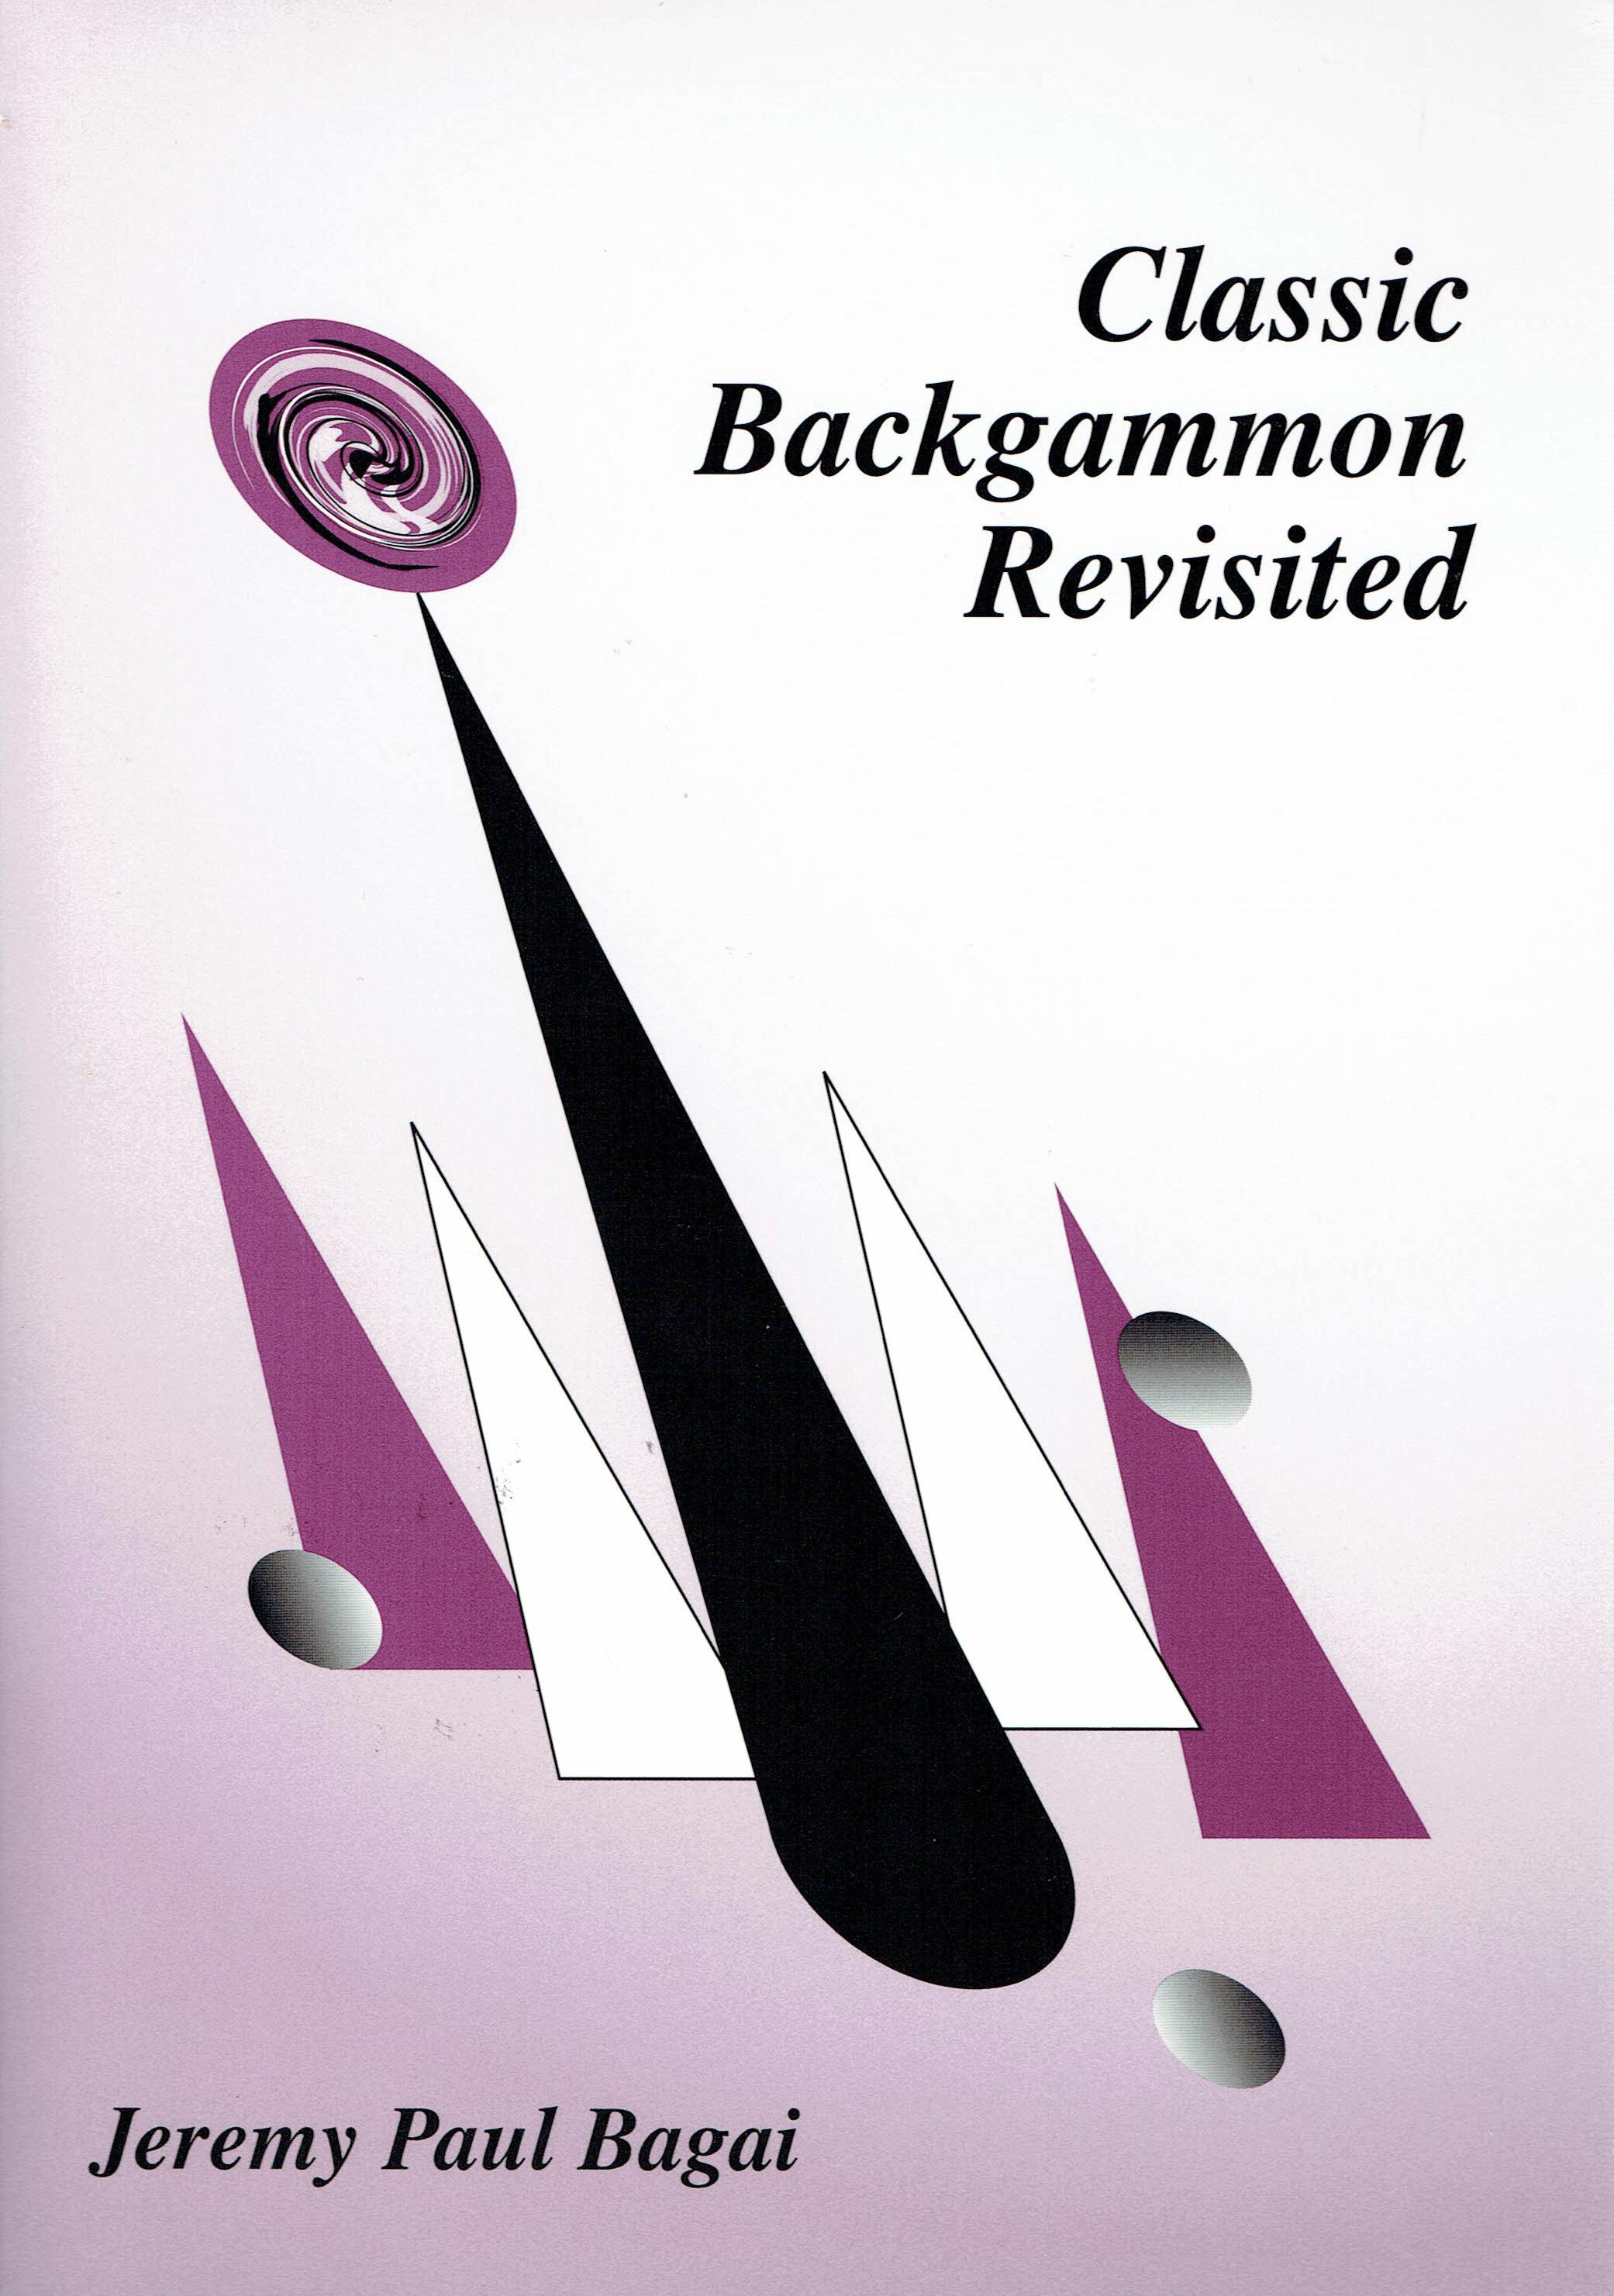 Classic Backgammon Revisited